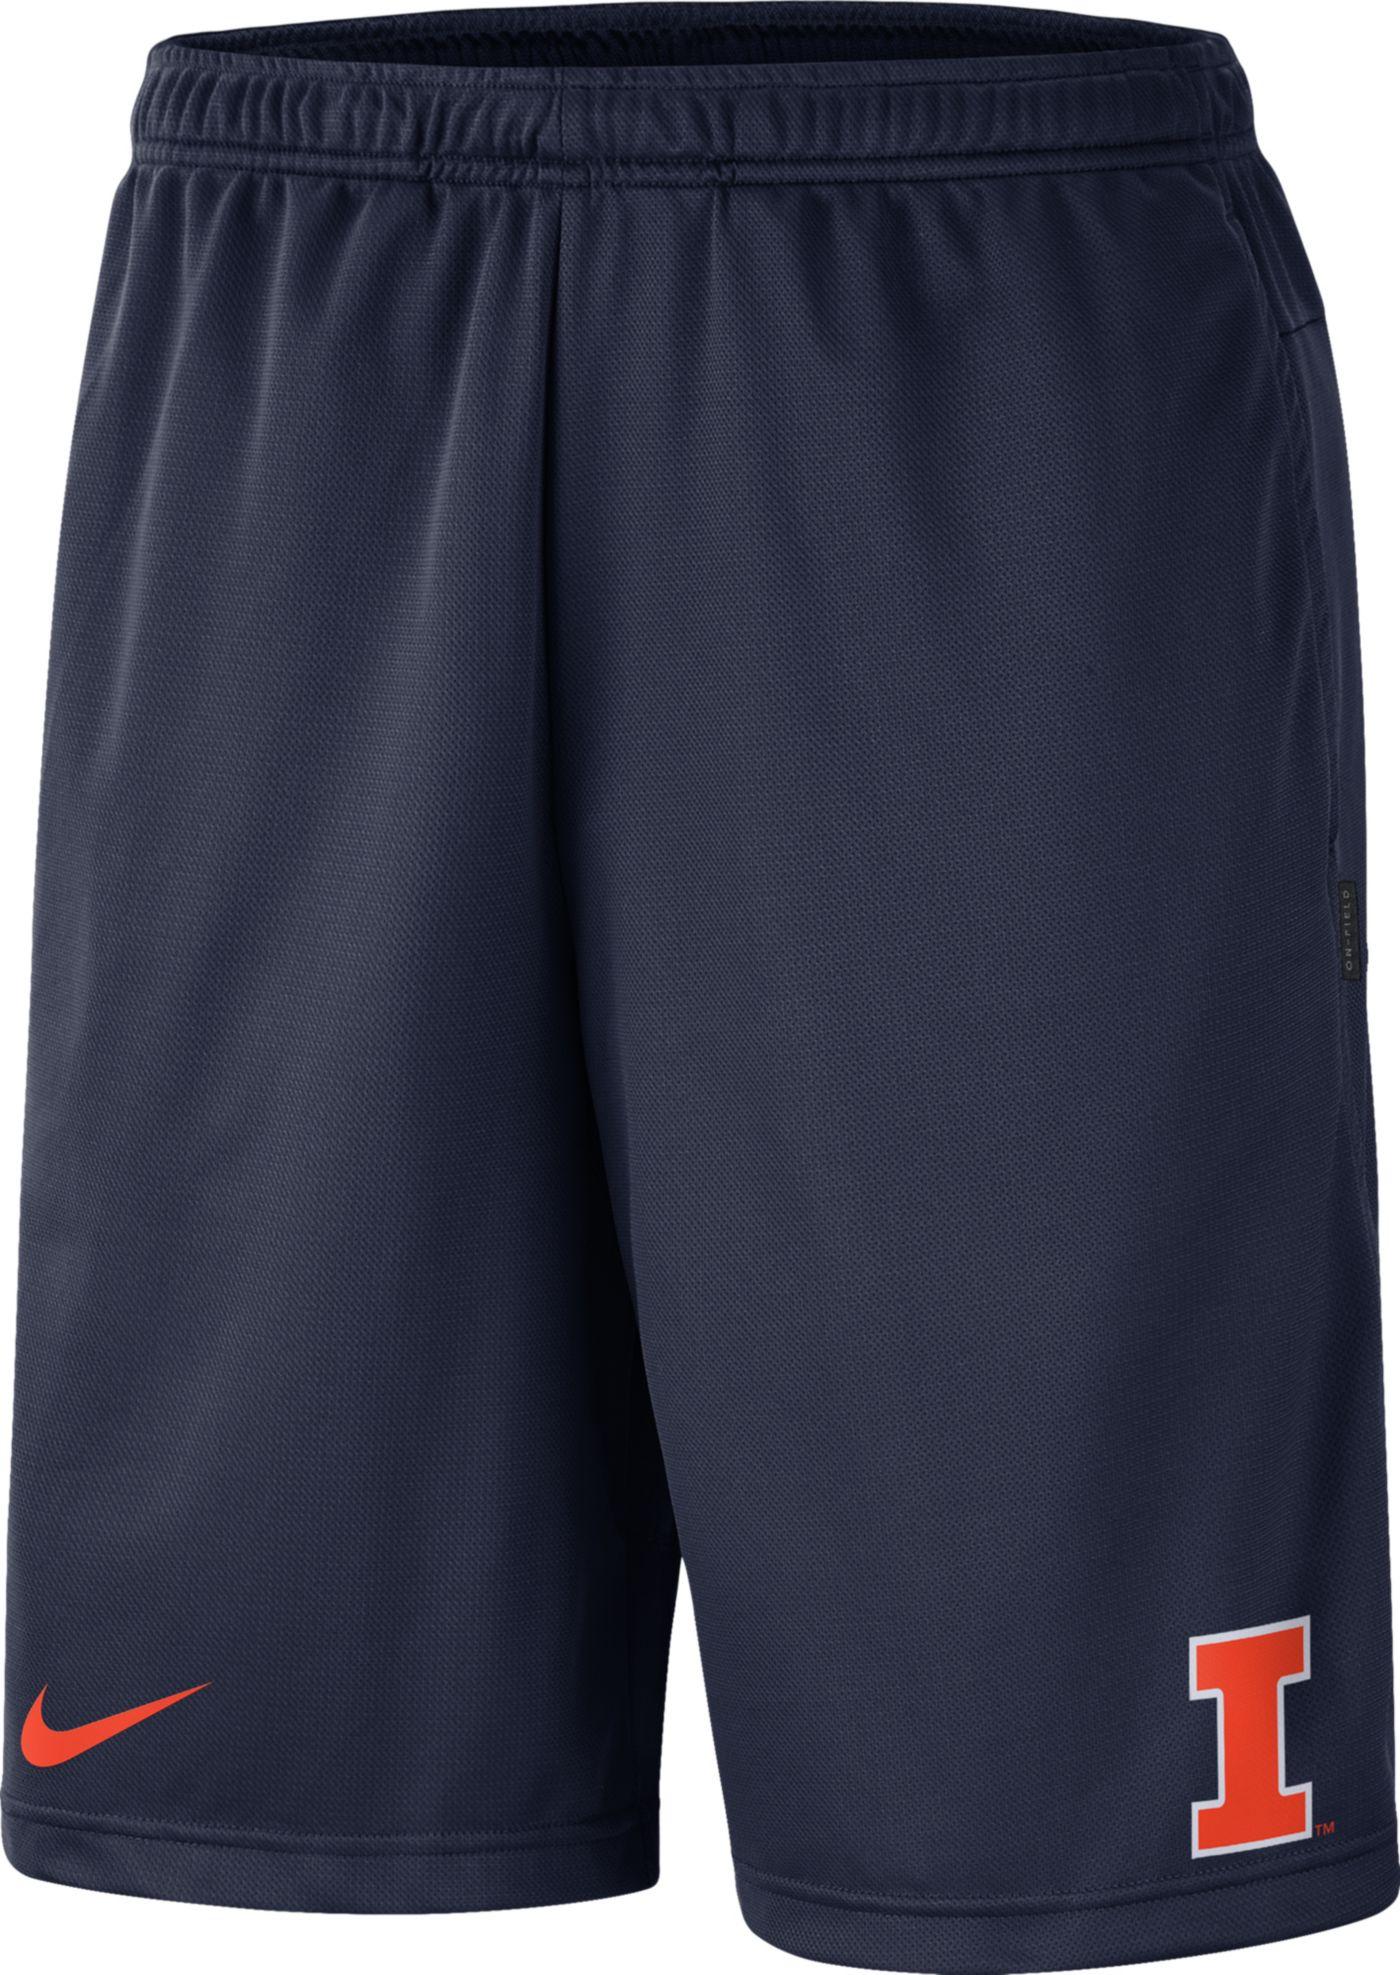 Nike Men's Illinois Fighting Illini Blue Dri-FIT Coach Shorts